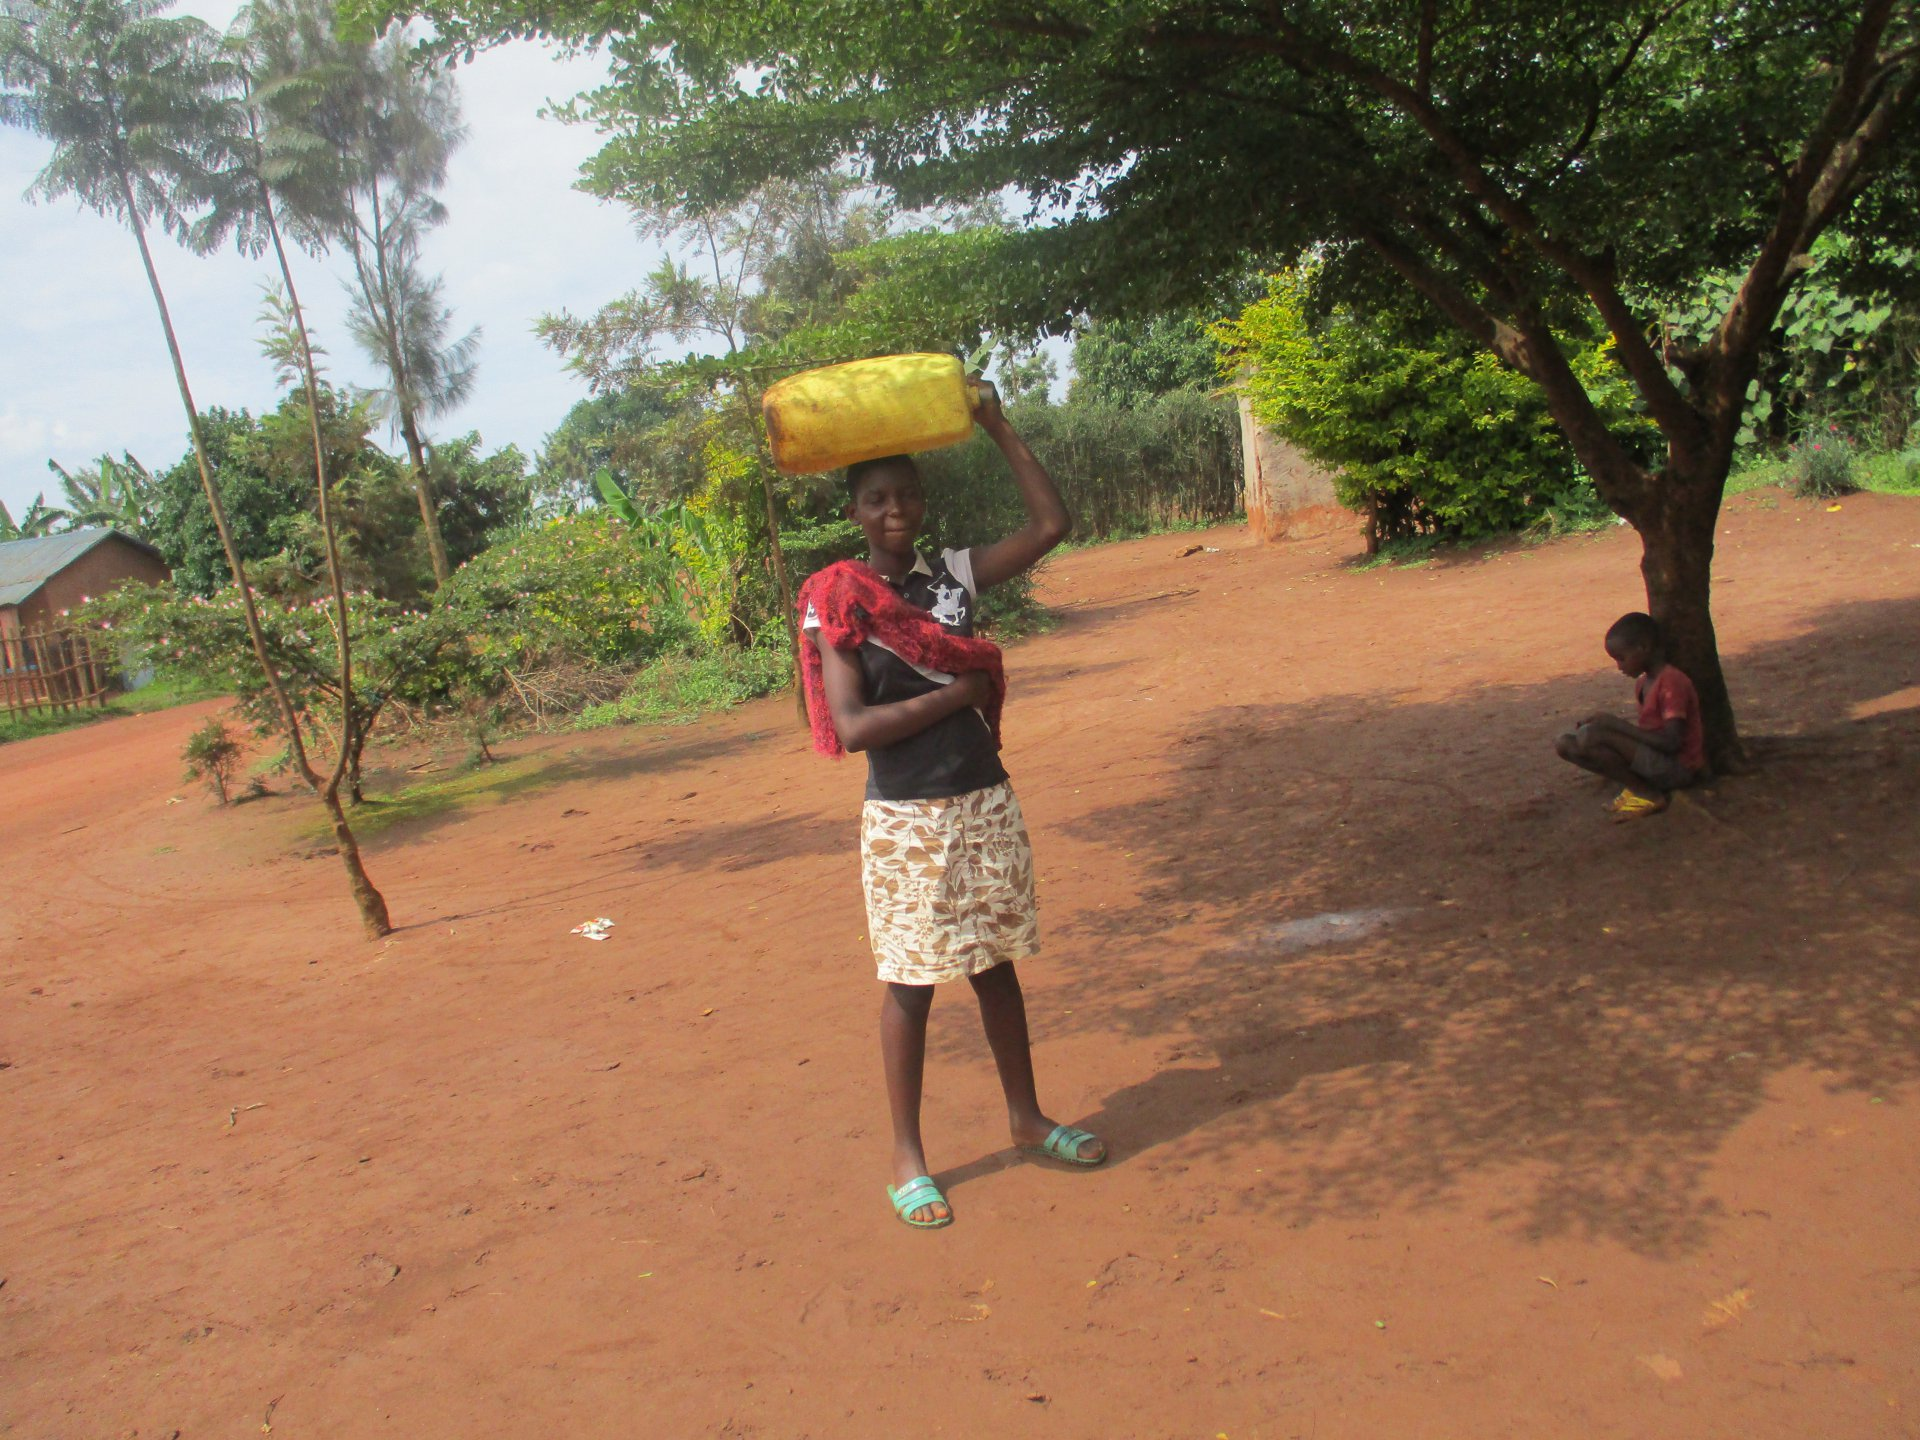 https://www.waterforlife.nl/files/visuals/_1920x1920_fit_center-center_85_none/Rwanda-Chantal.JPG